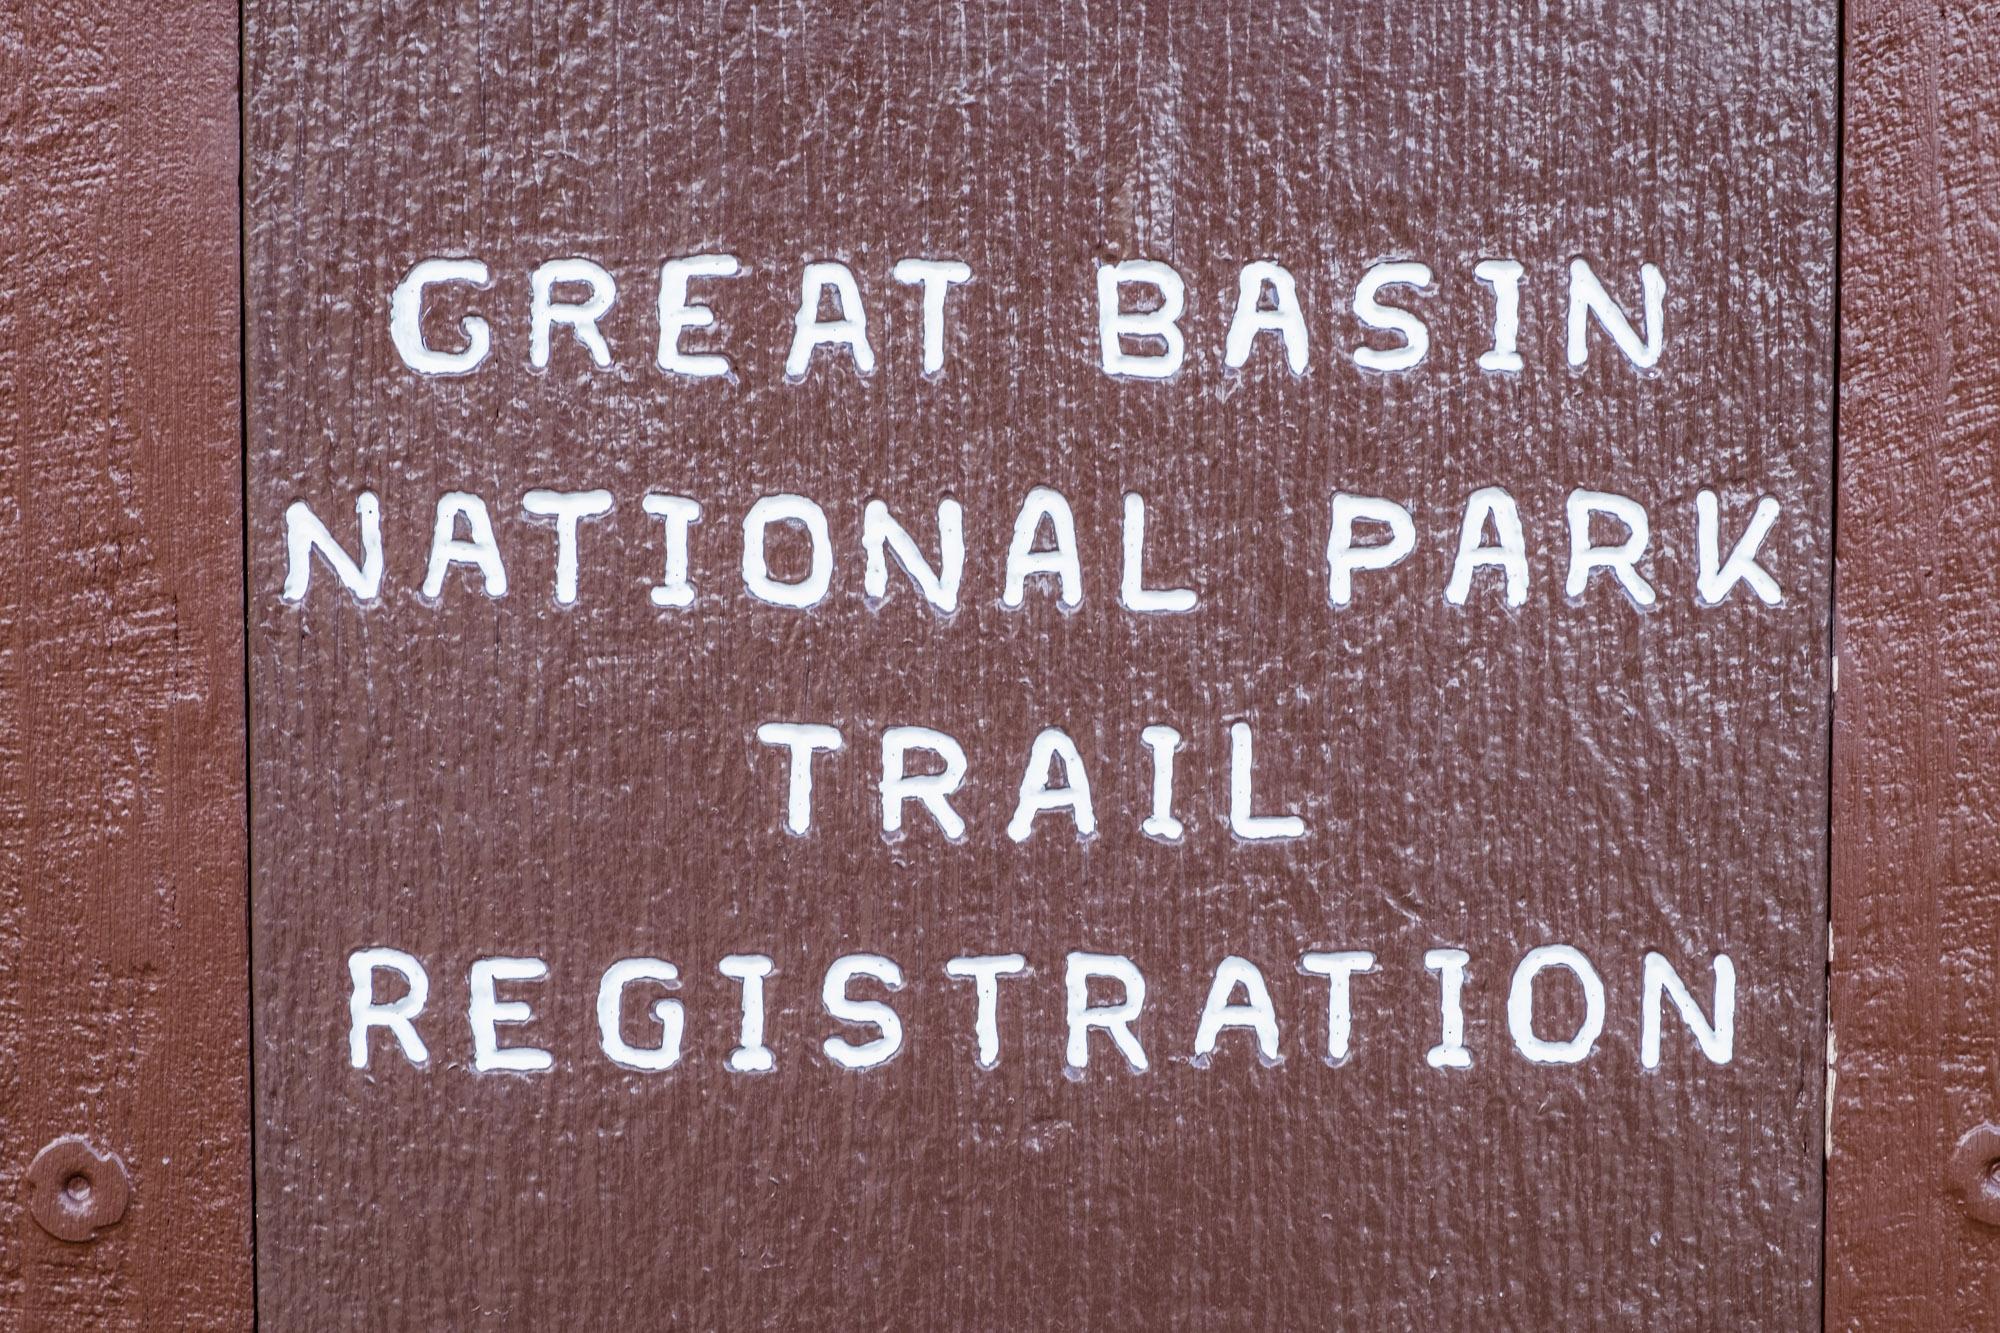 Great Basin National Park - 009.jpg